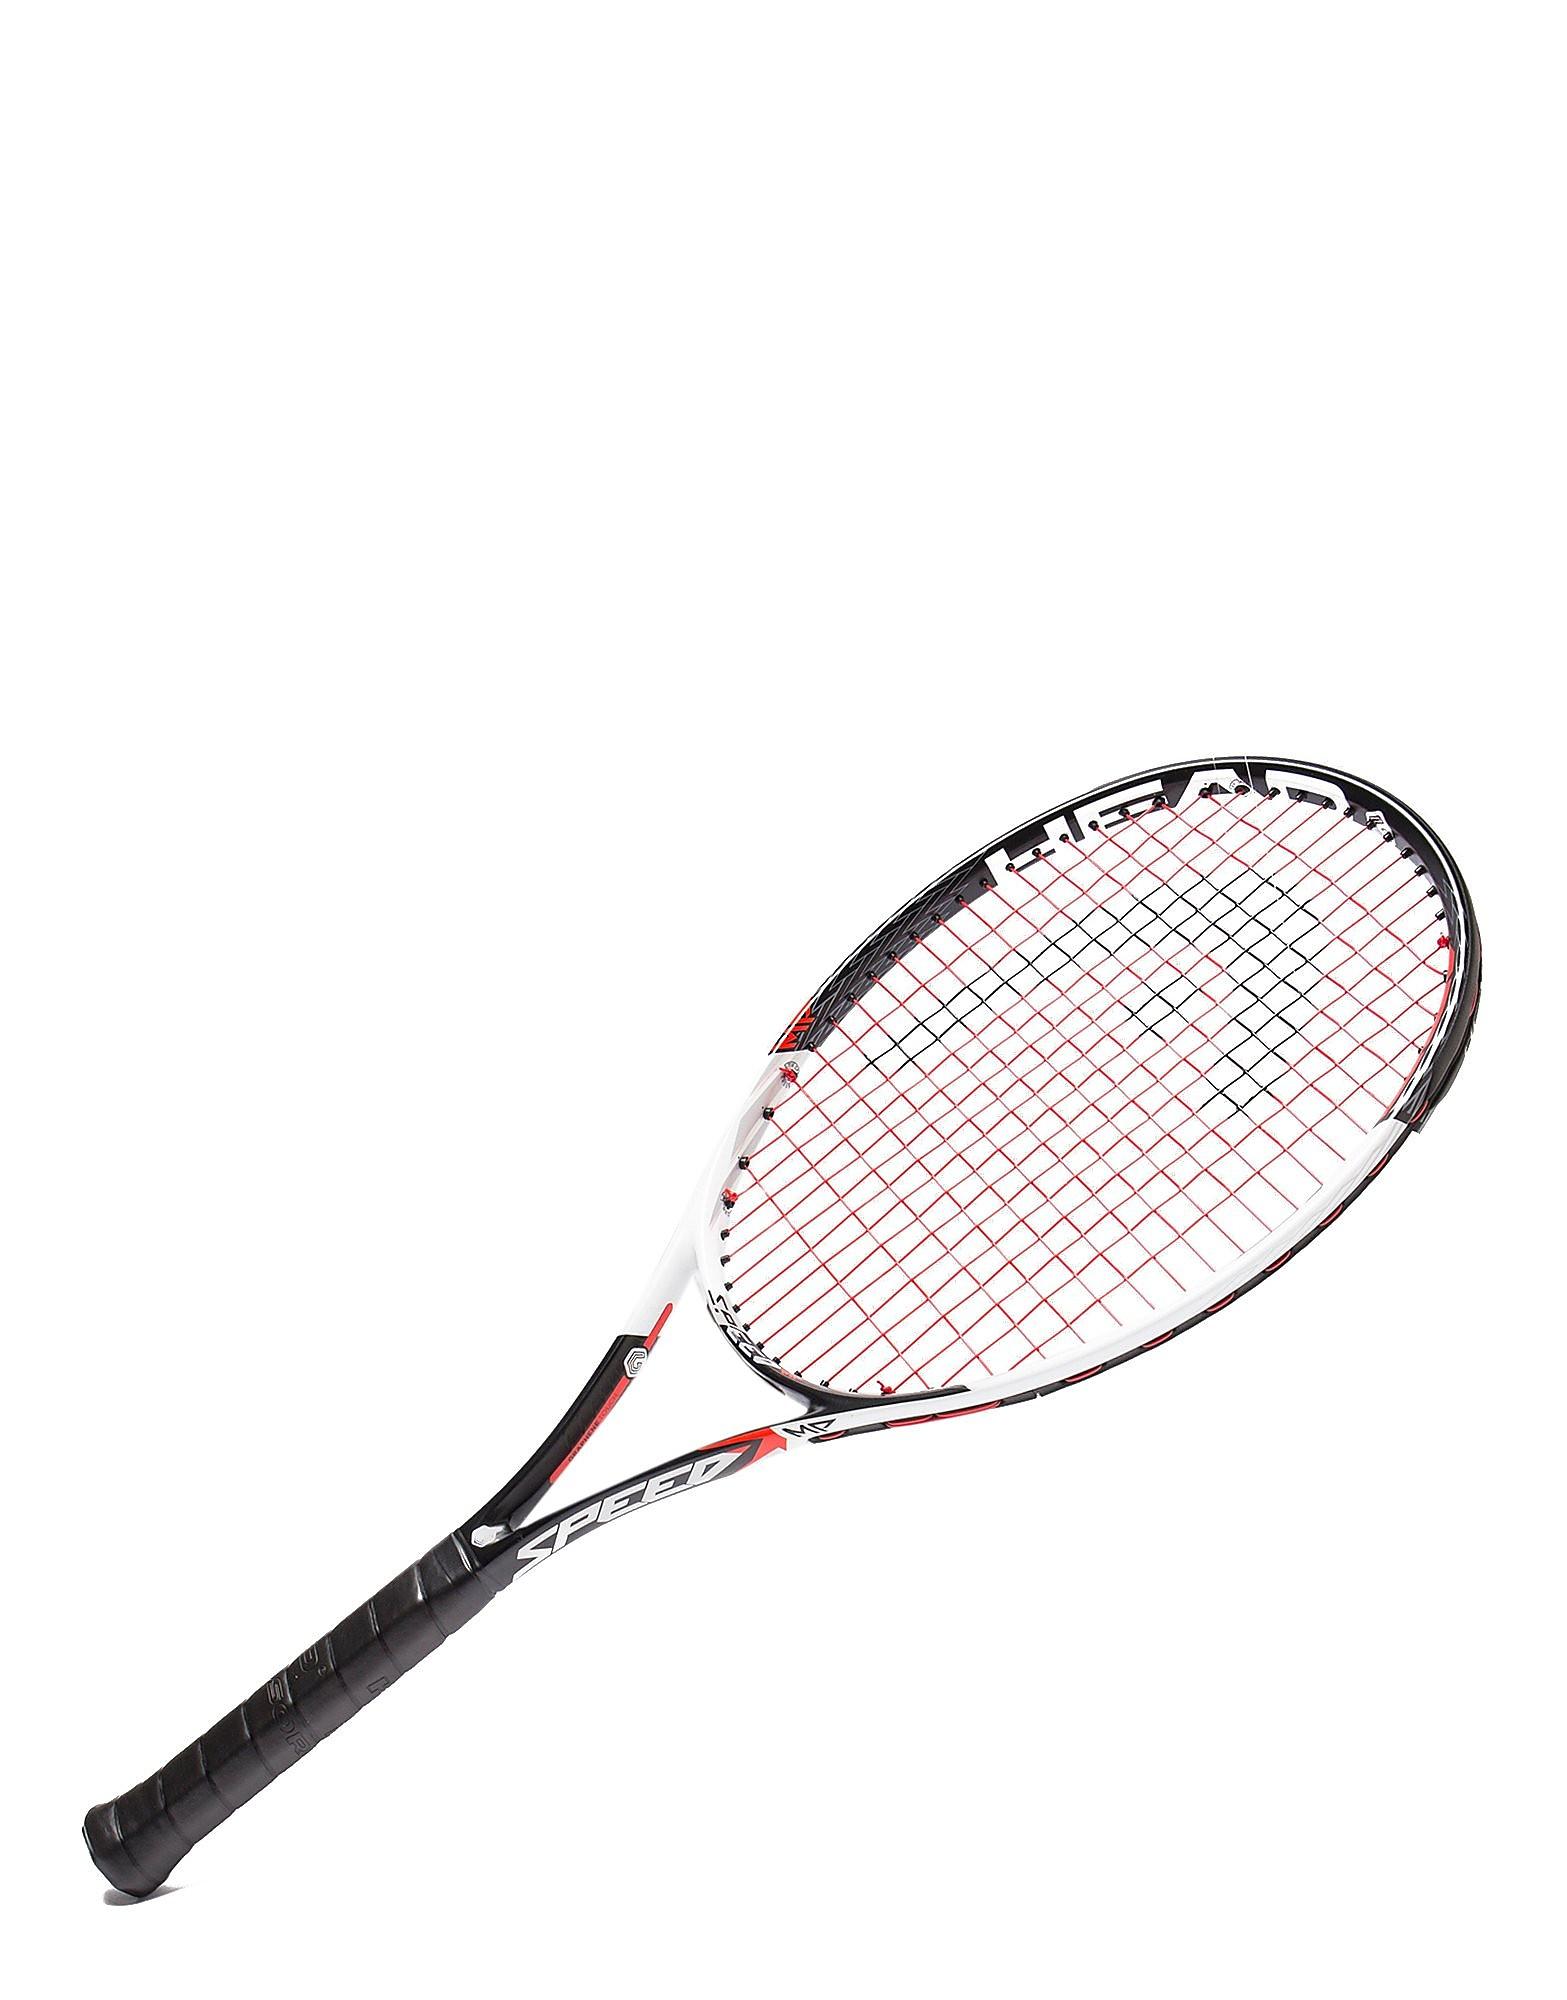 Head Graphene Touch Speed Tennis Racket